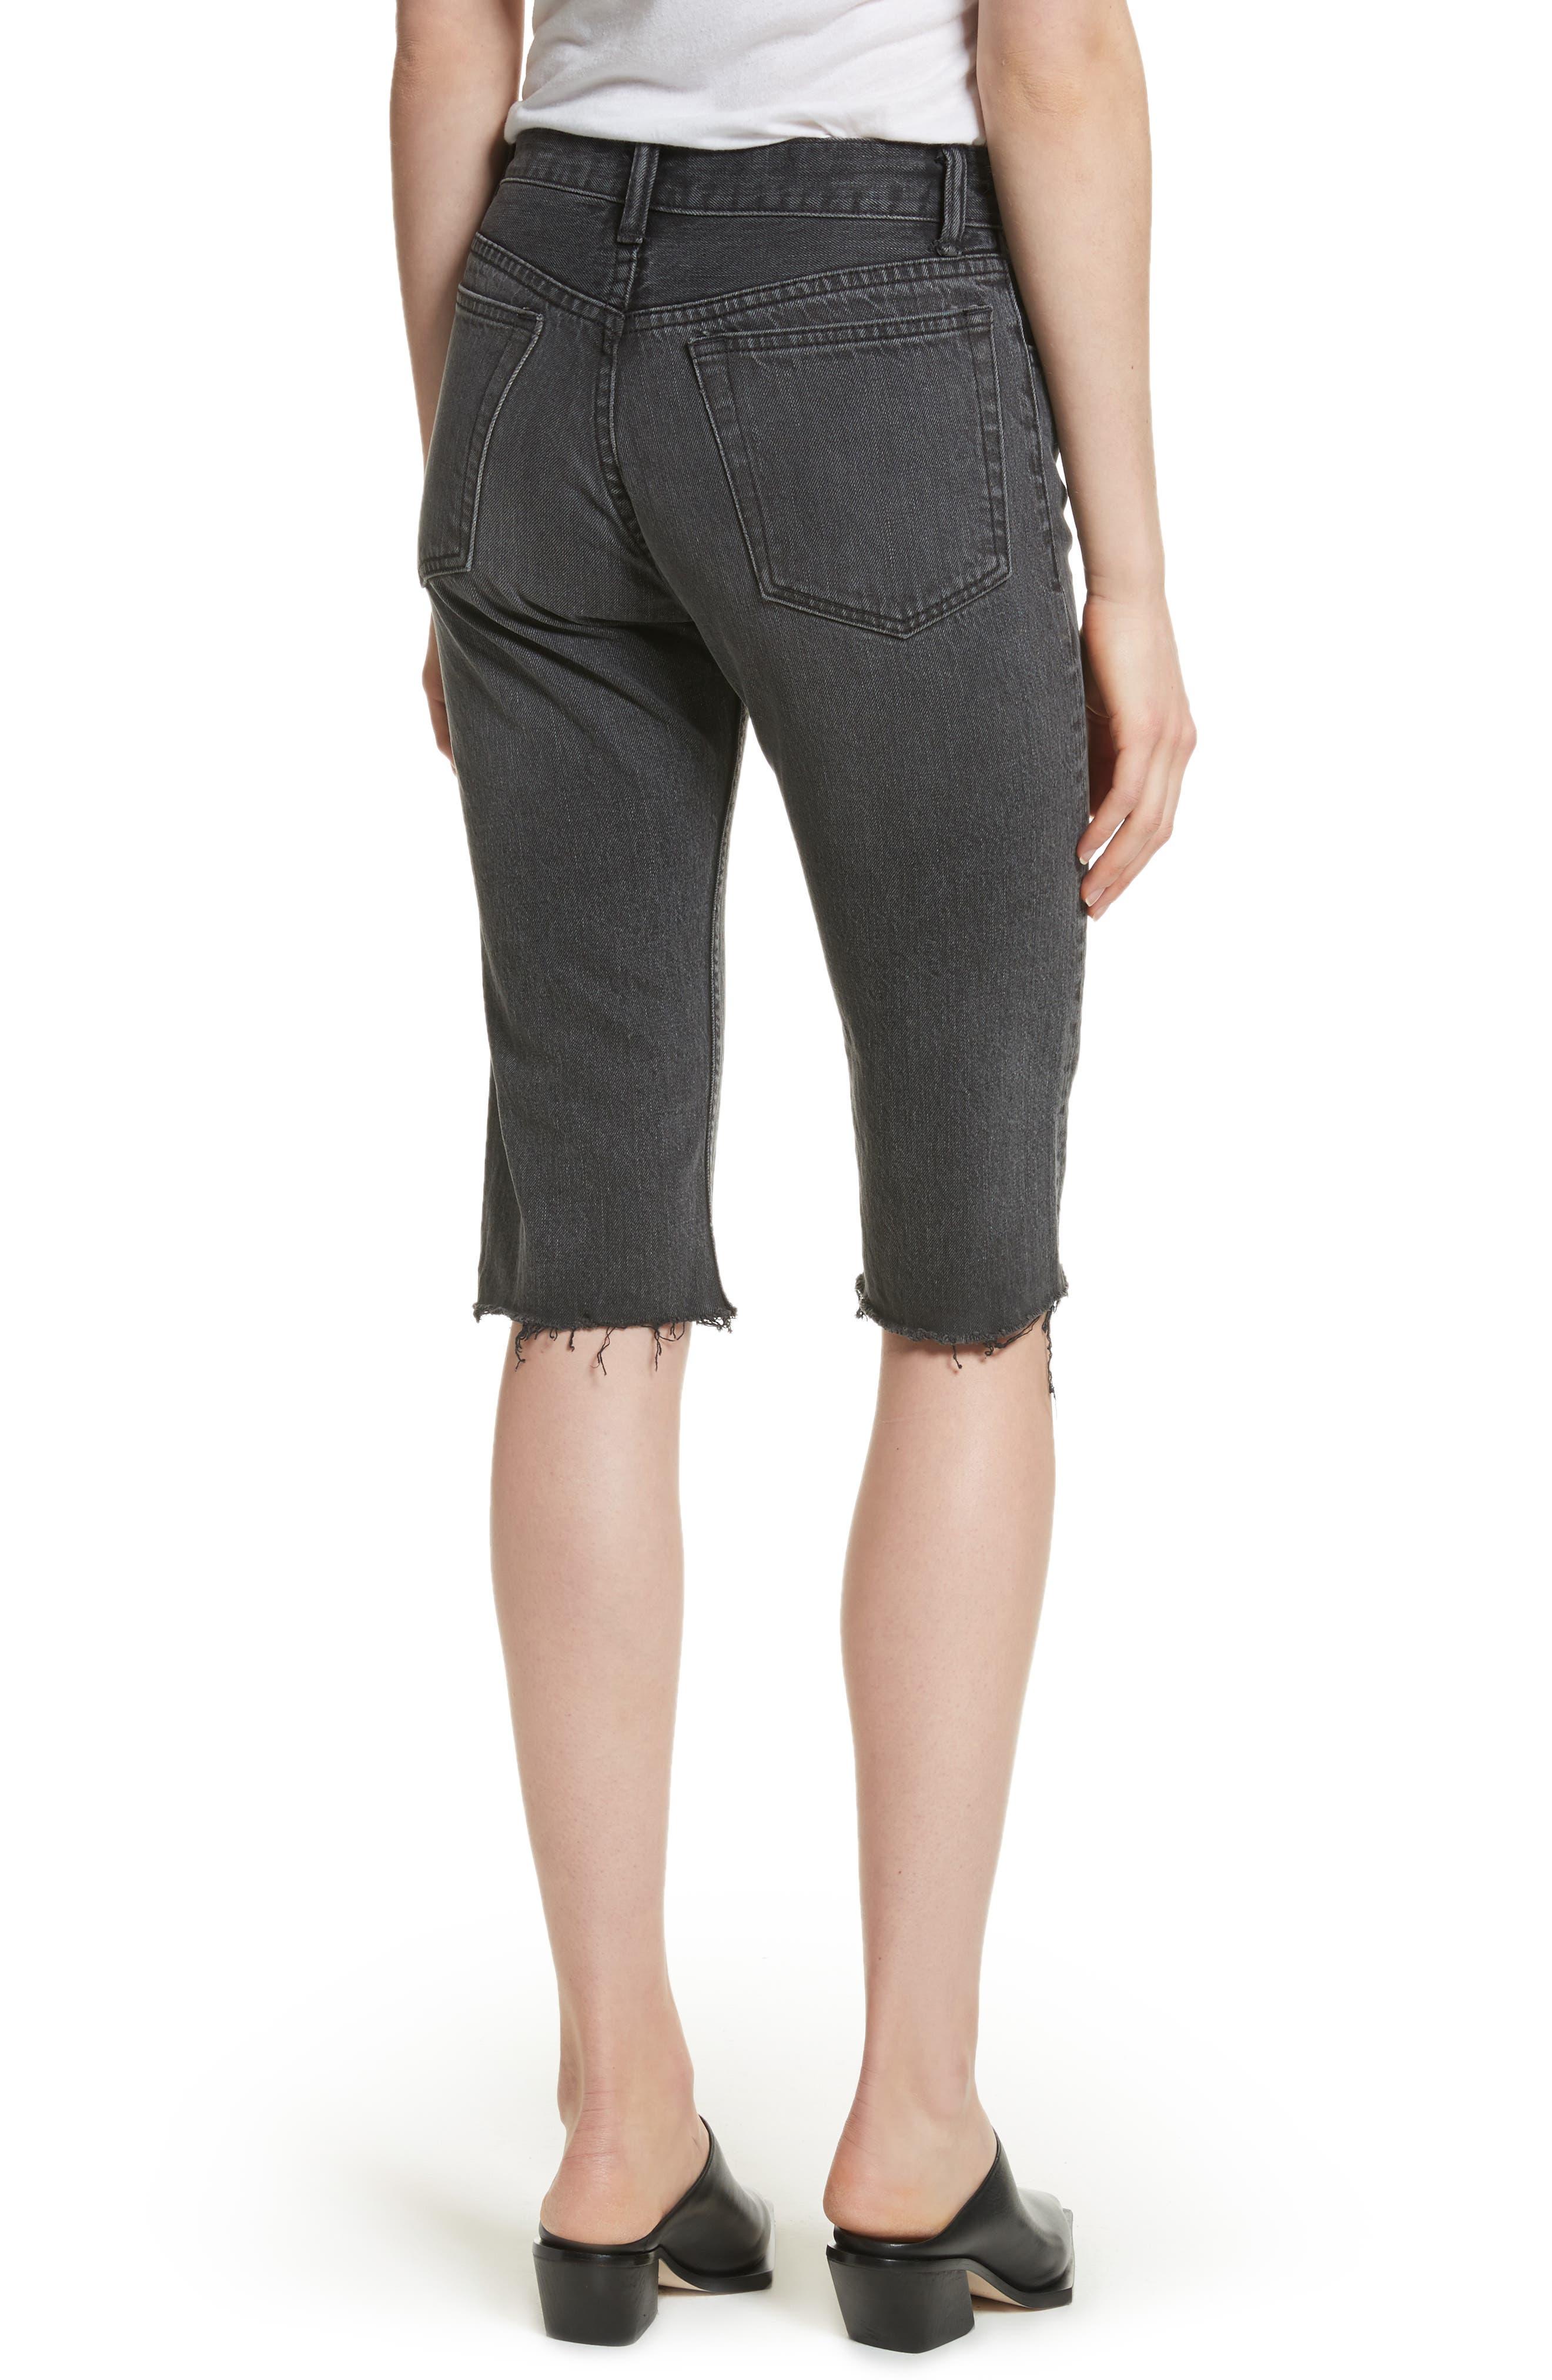 Cutoff Knee Length Denim Shorts,                             Alternate thumbnail 2, color,                             Rigid Black